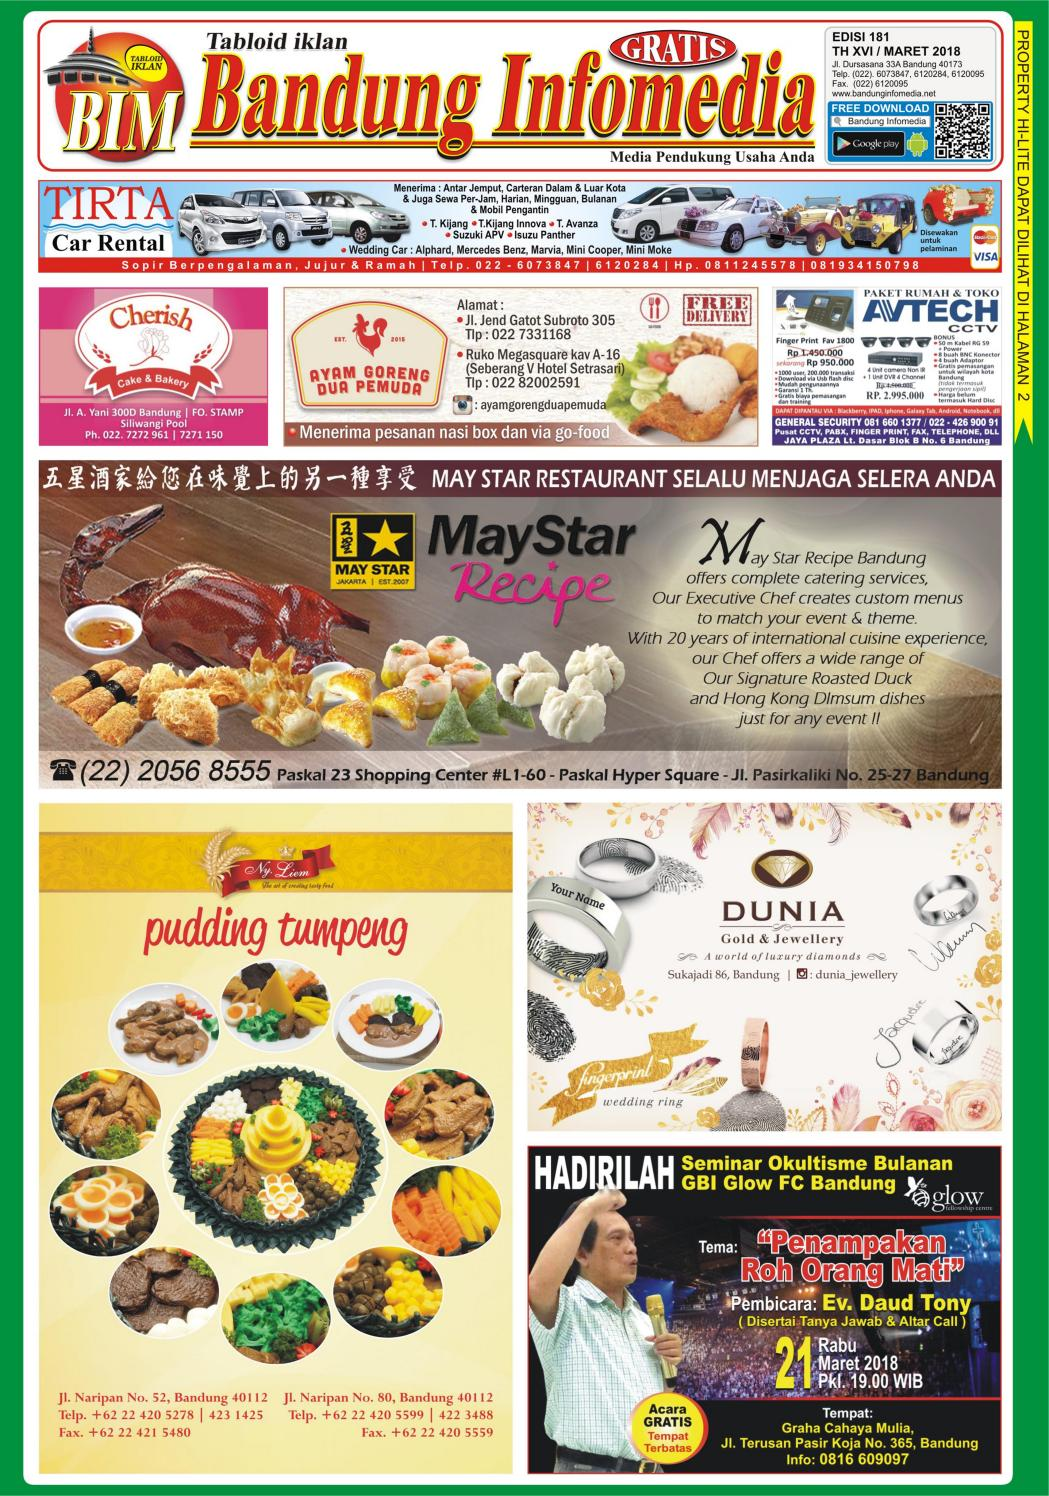 E Tabloid Bandung Infomedia Edisi 181 Maret 2018 By Tabloid